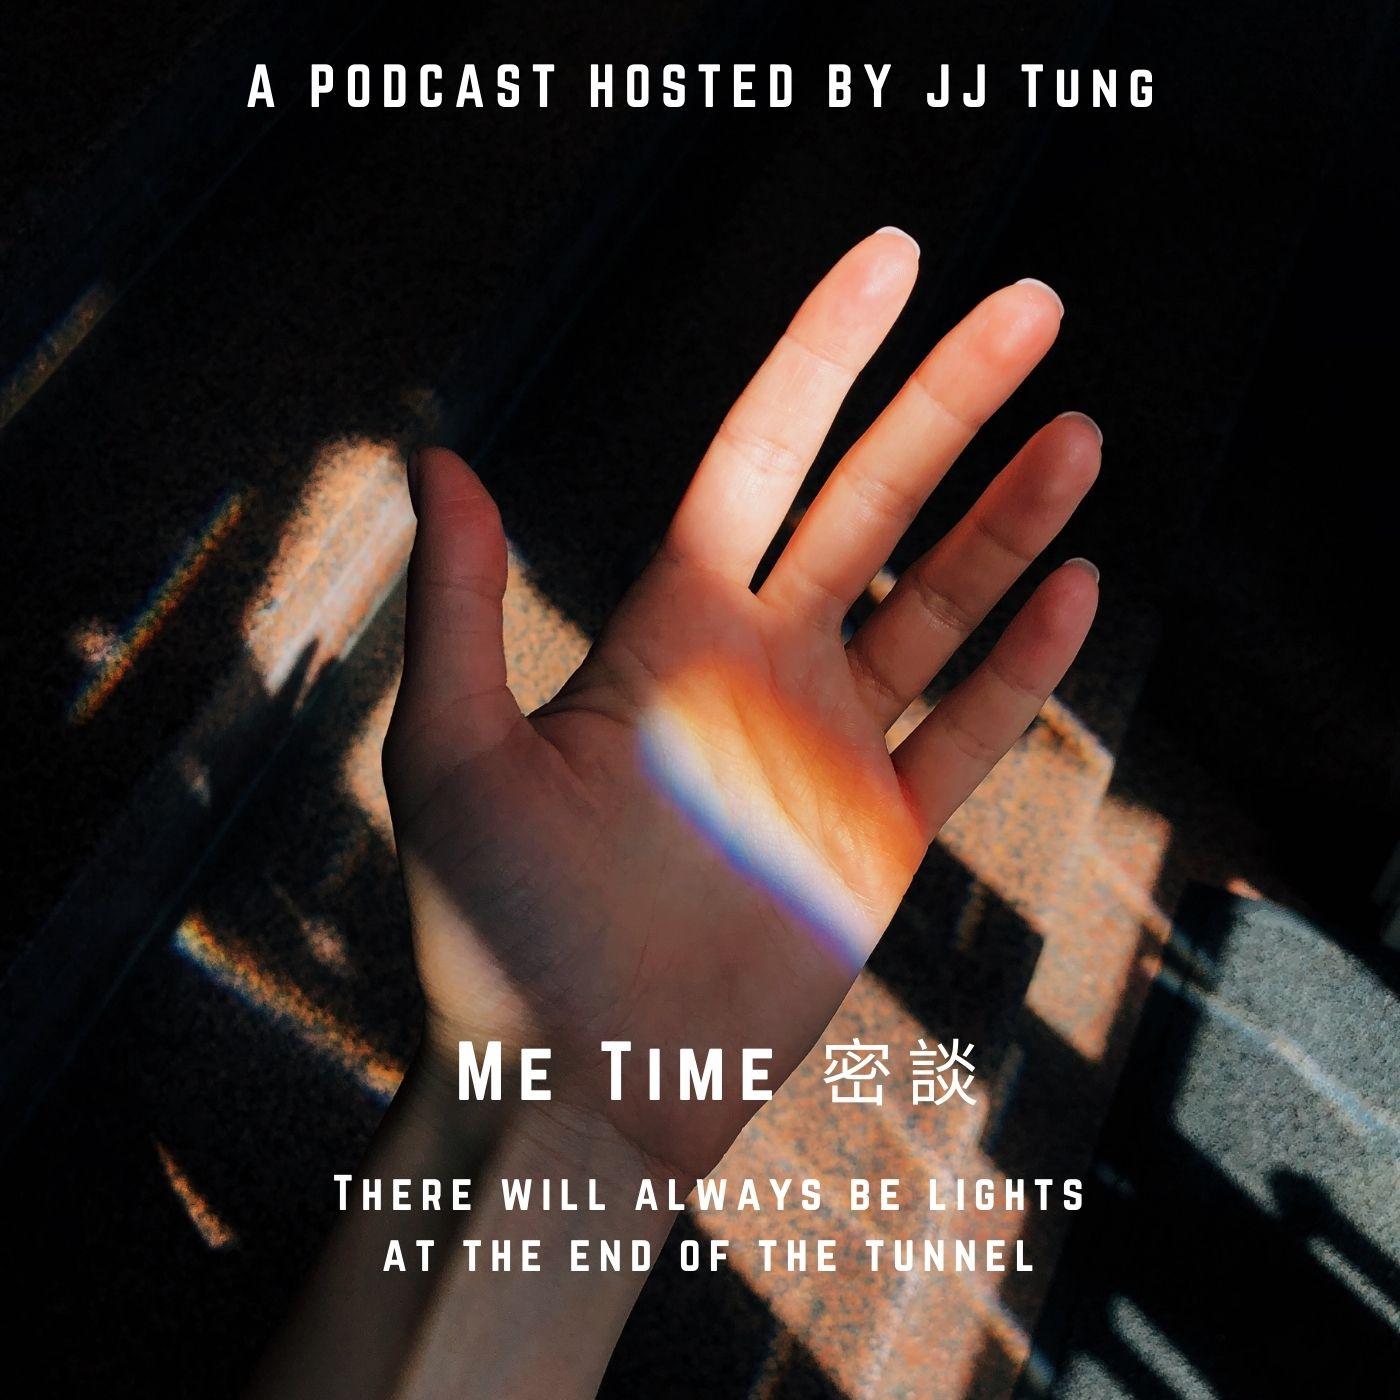 MeTime Episode 8 - 創造新生活,隨時都可以